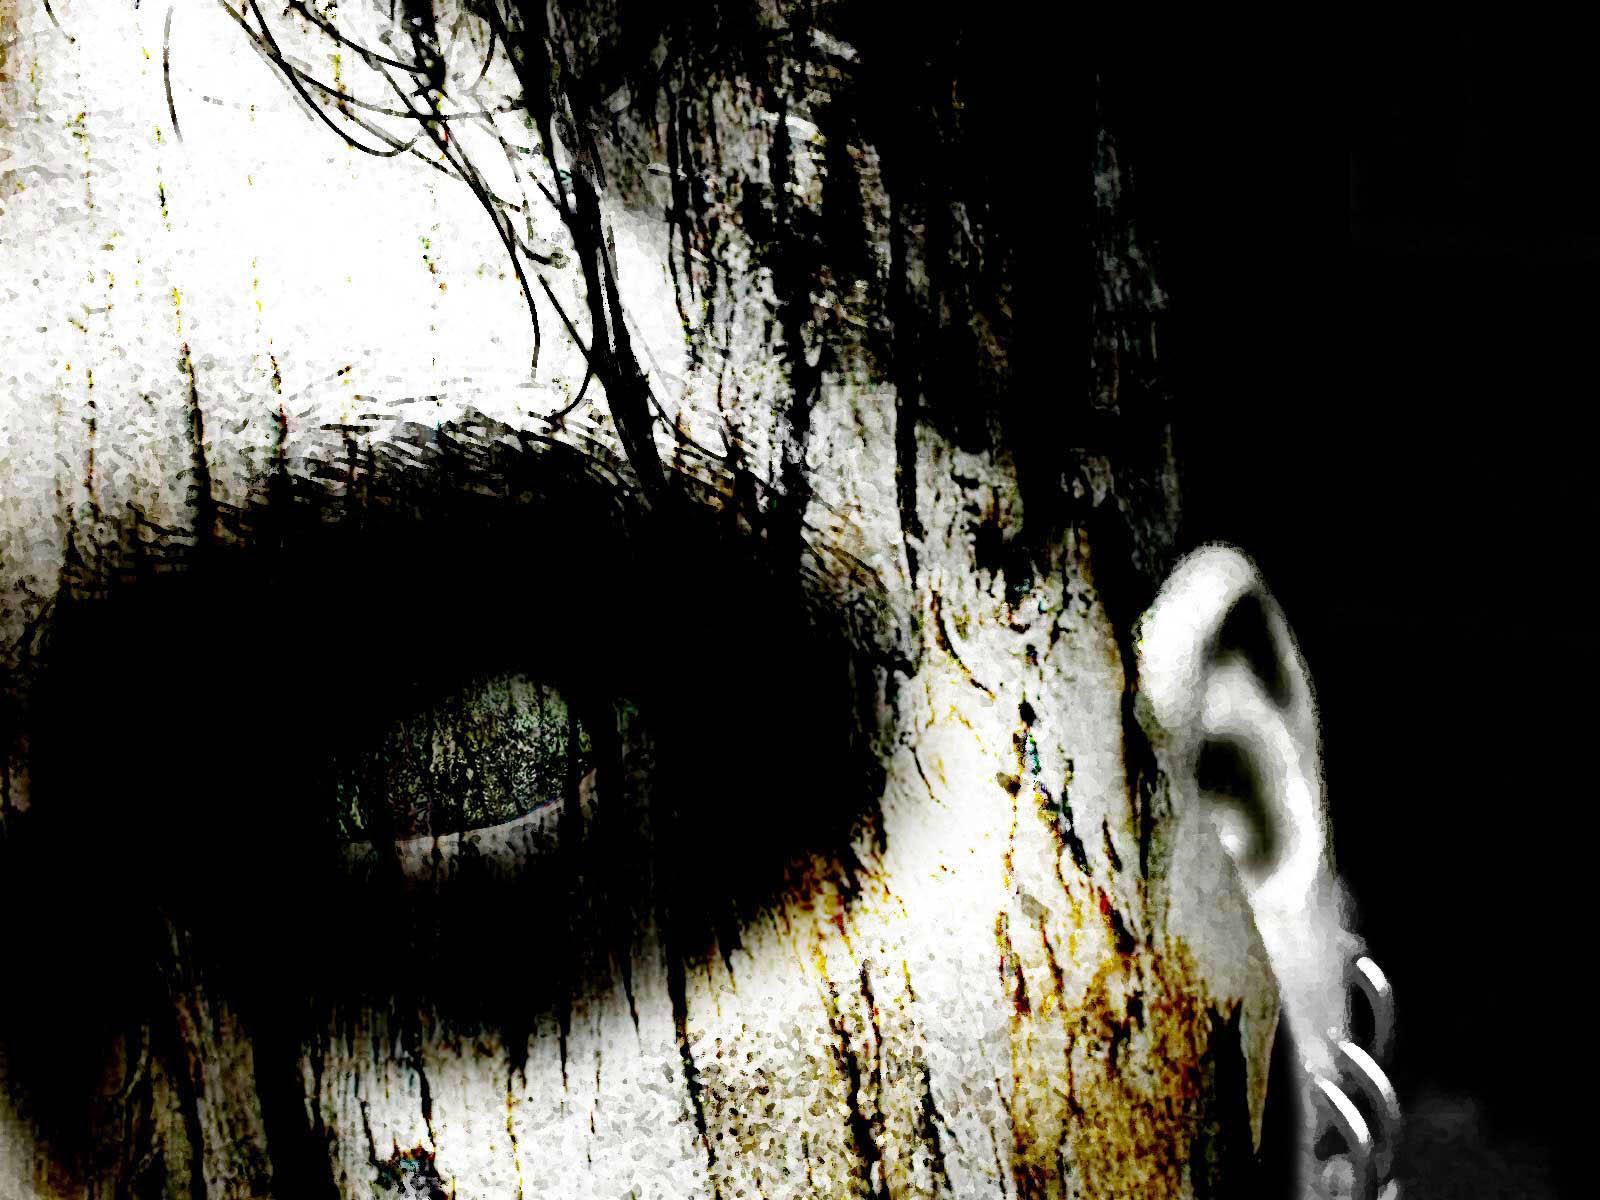 Scary Horror Wallpapers Scary Horror Desktop Wallpapers Scary Horror 1600x1200